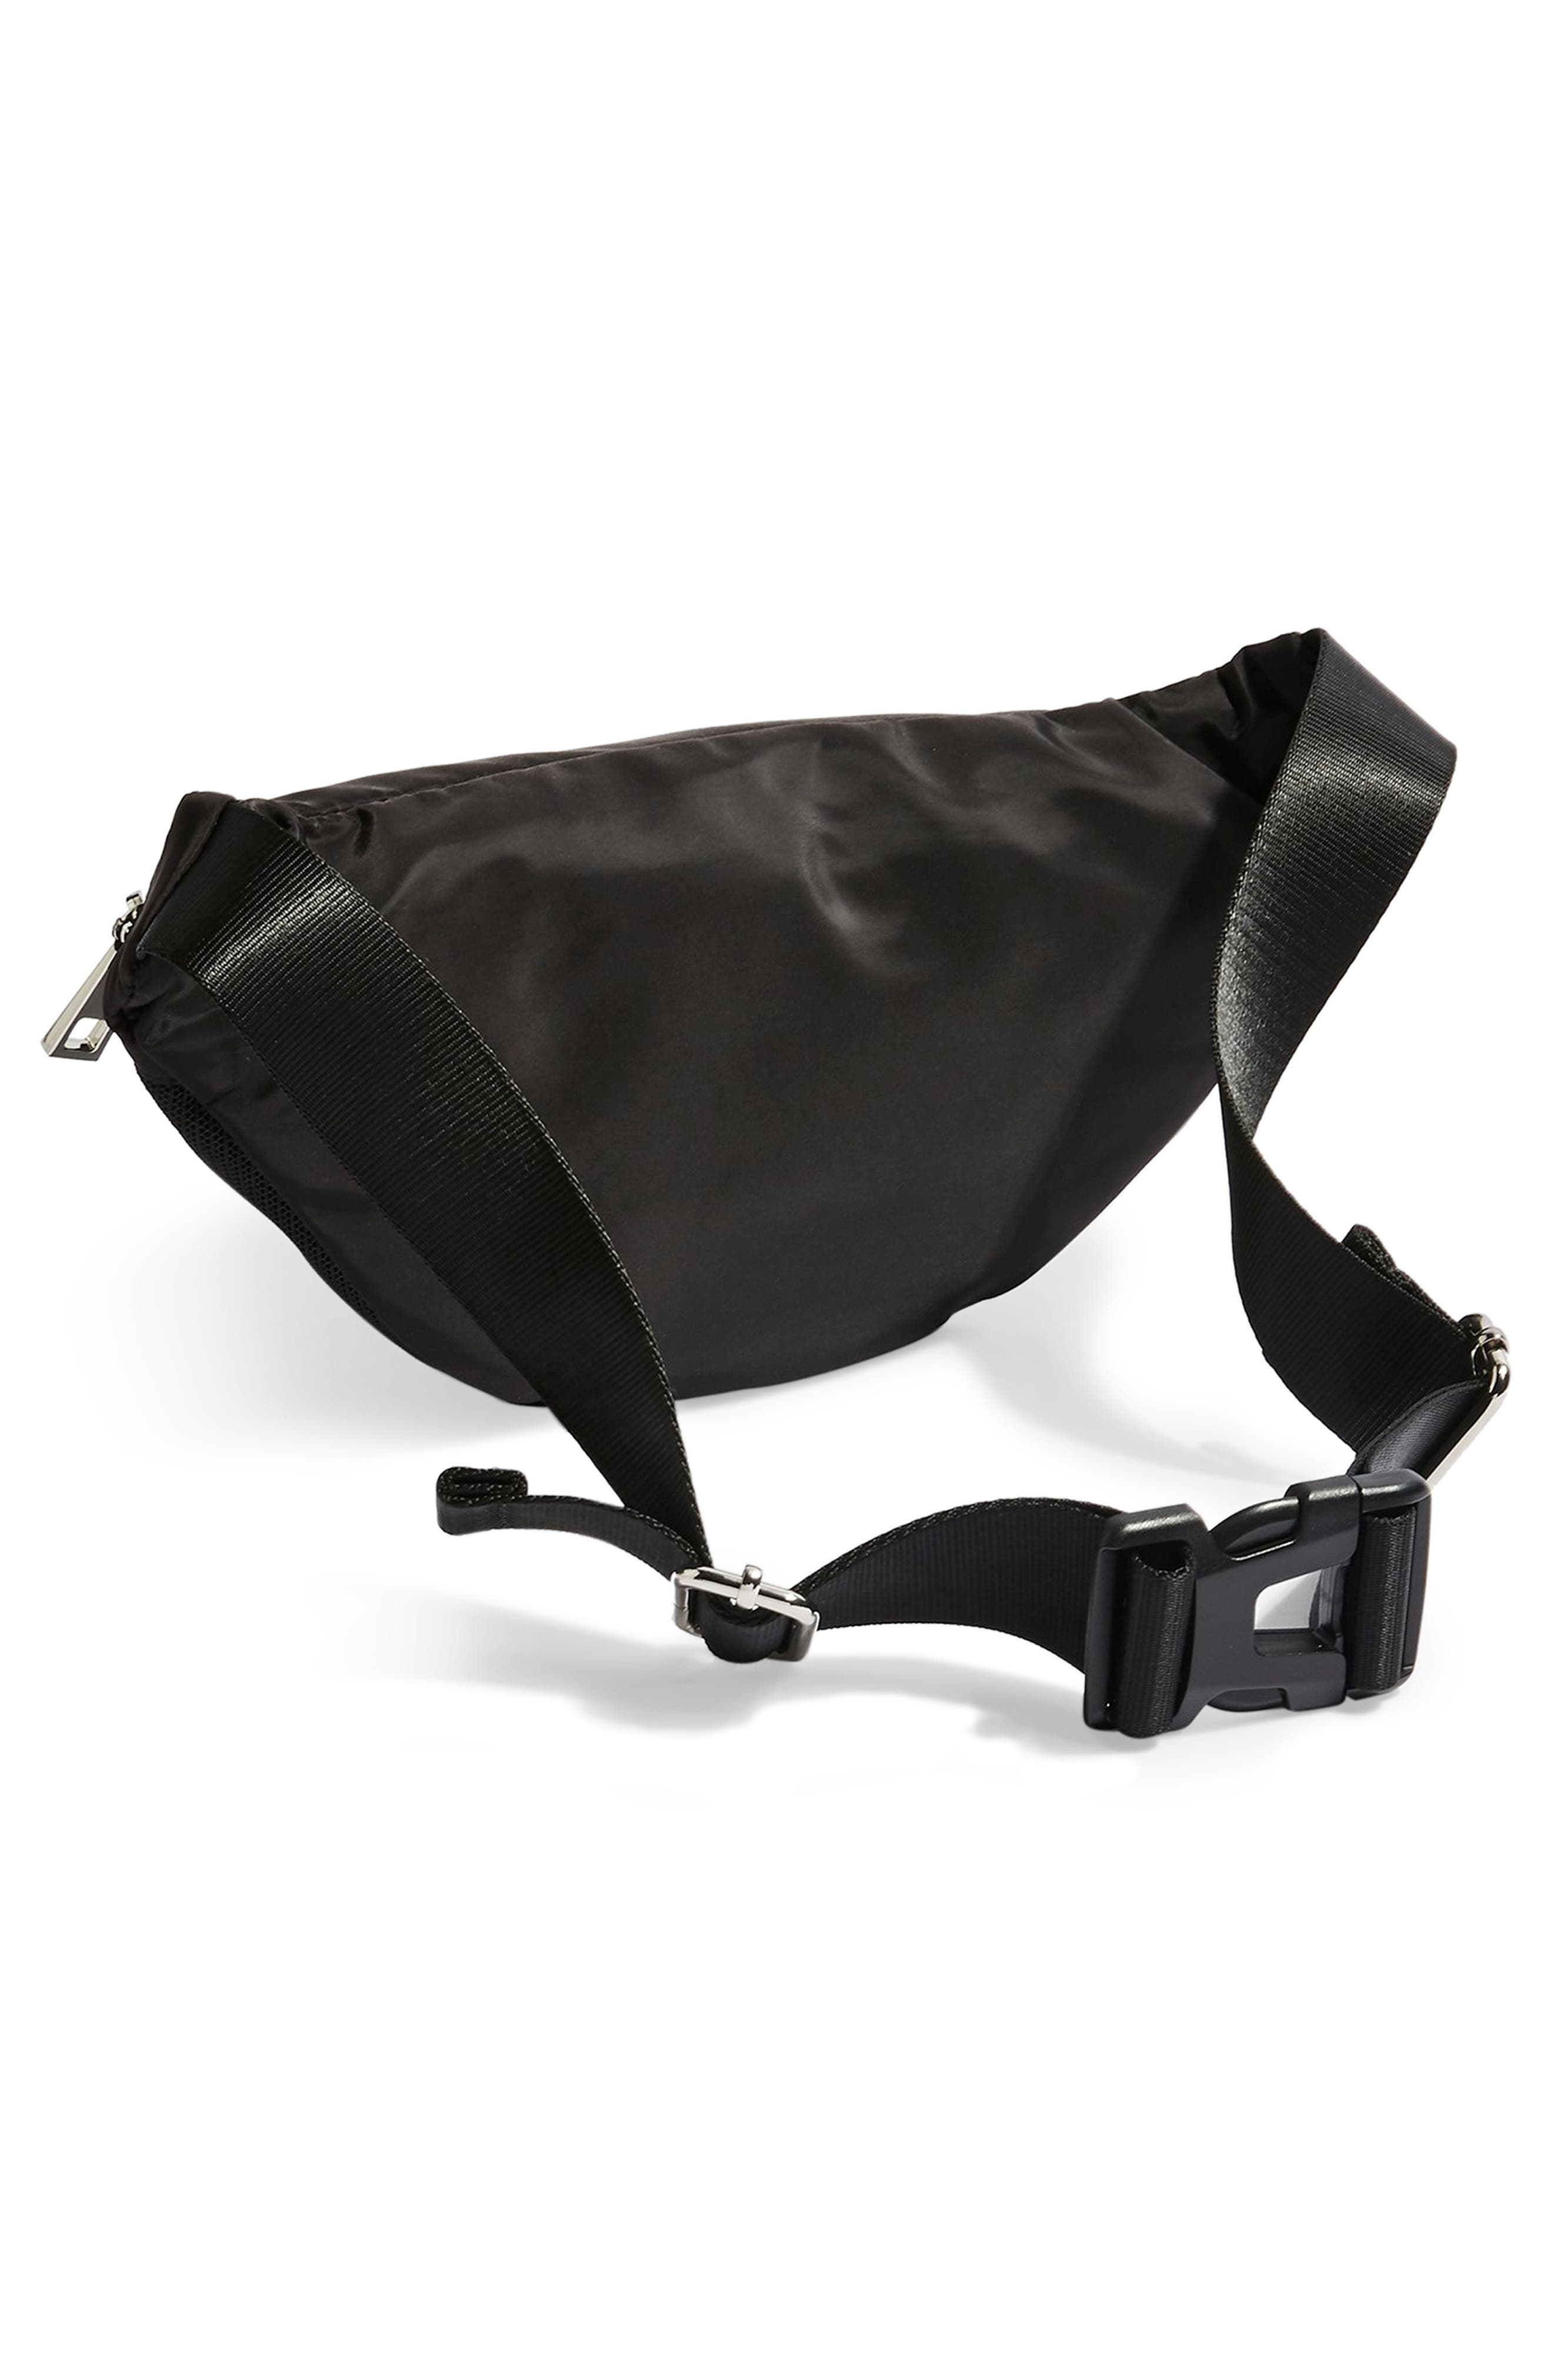 TOPSHOP, Warsaw Nylon Belt Bag, Alternate thumbnail 4, color, BLACK